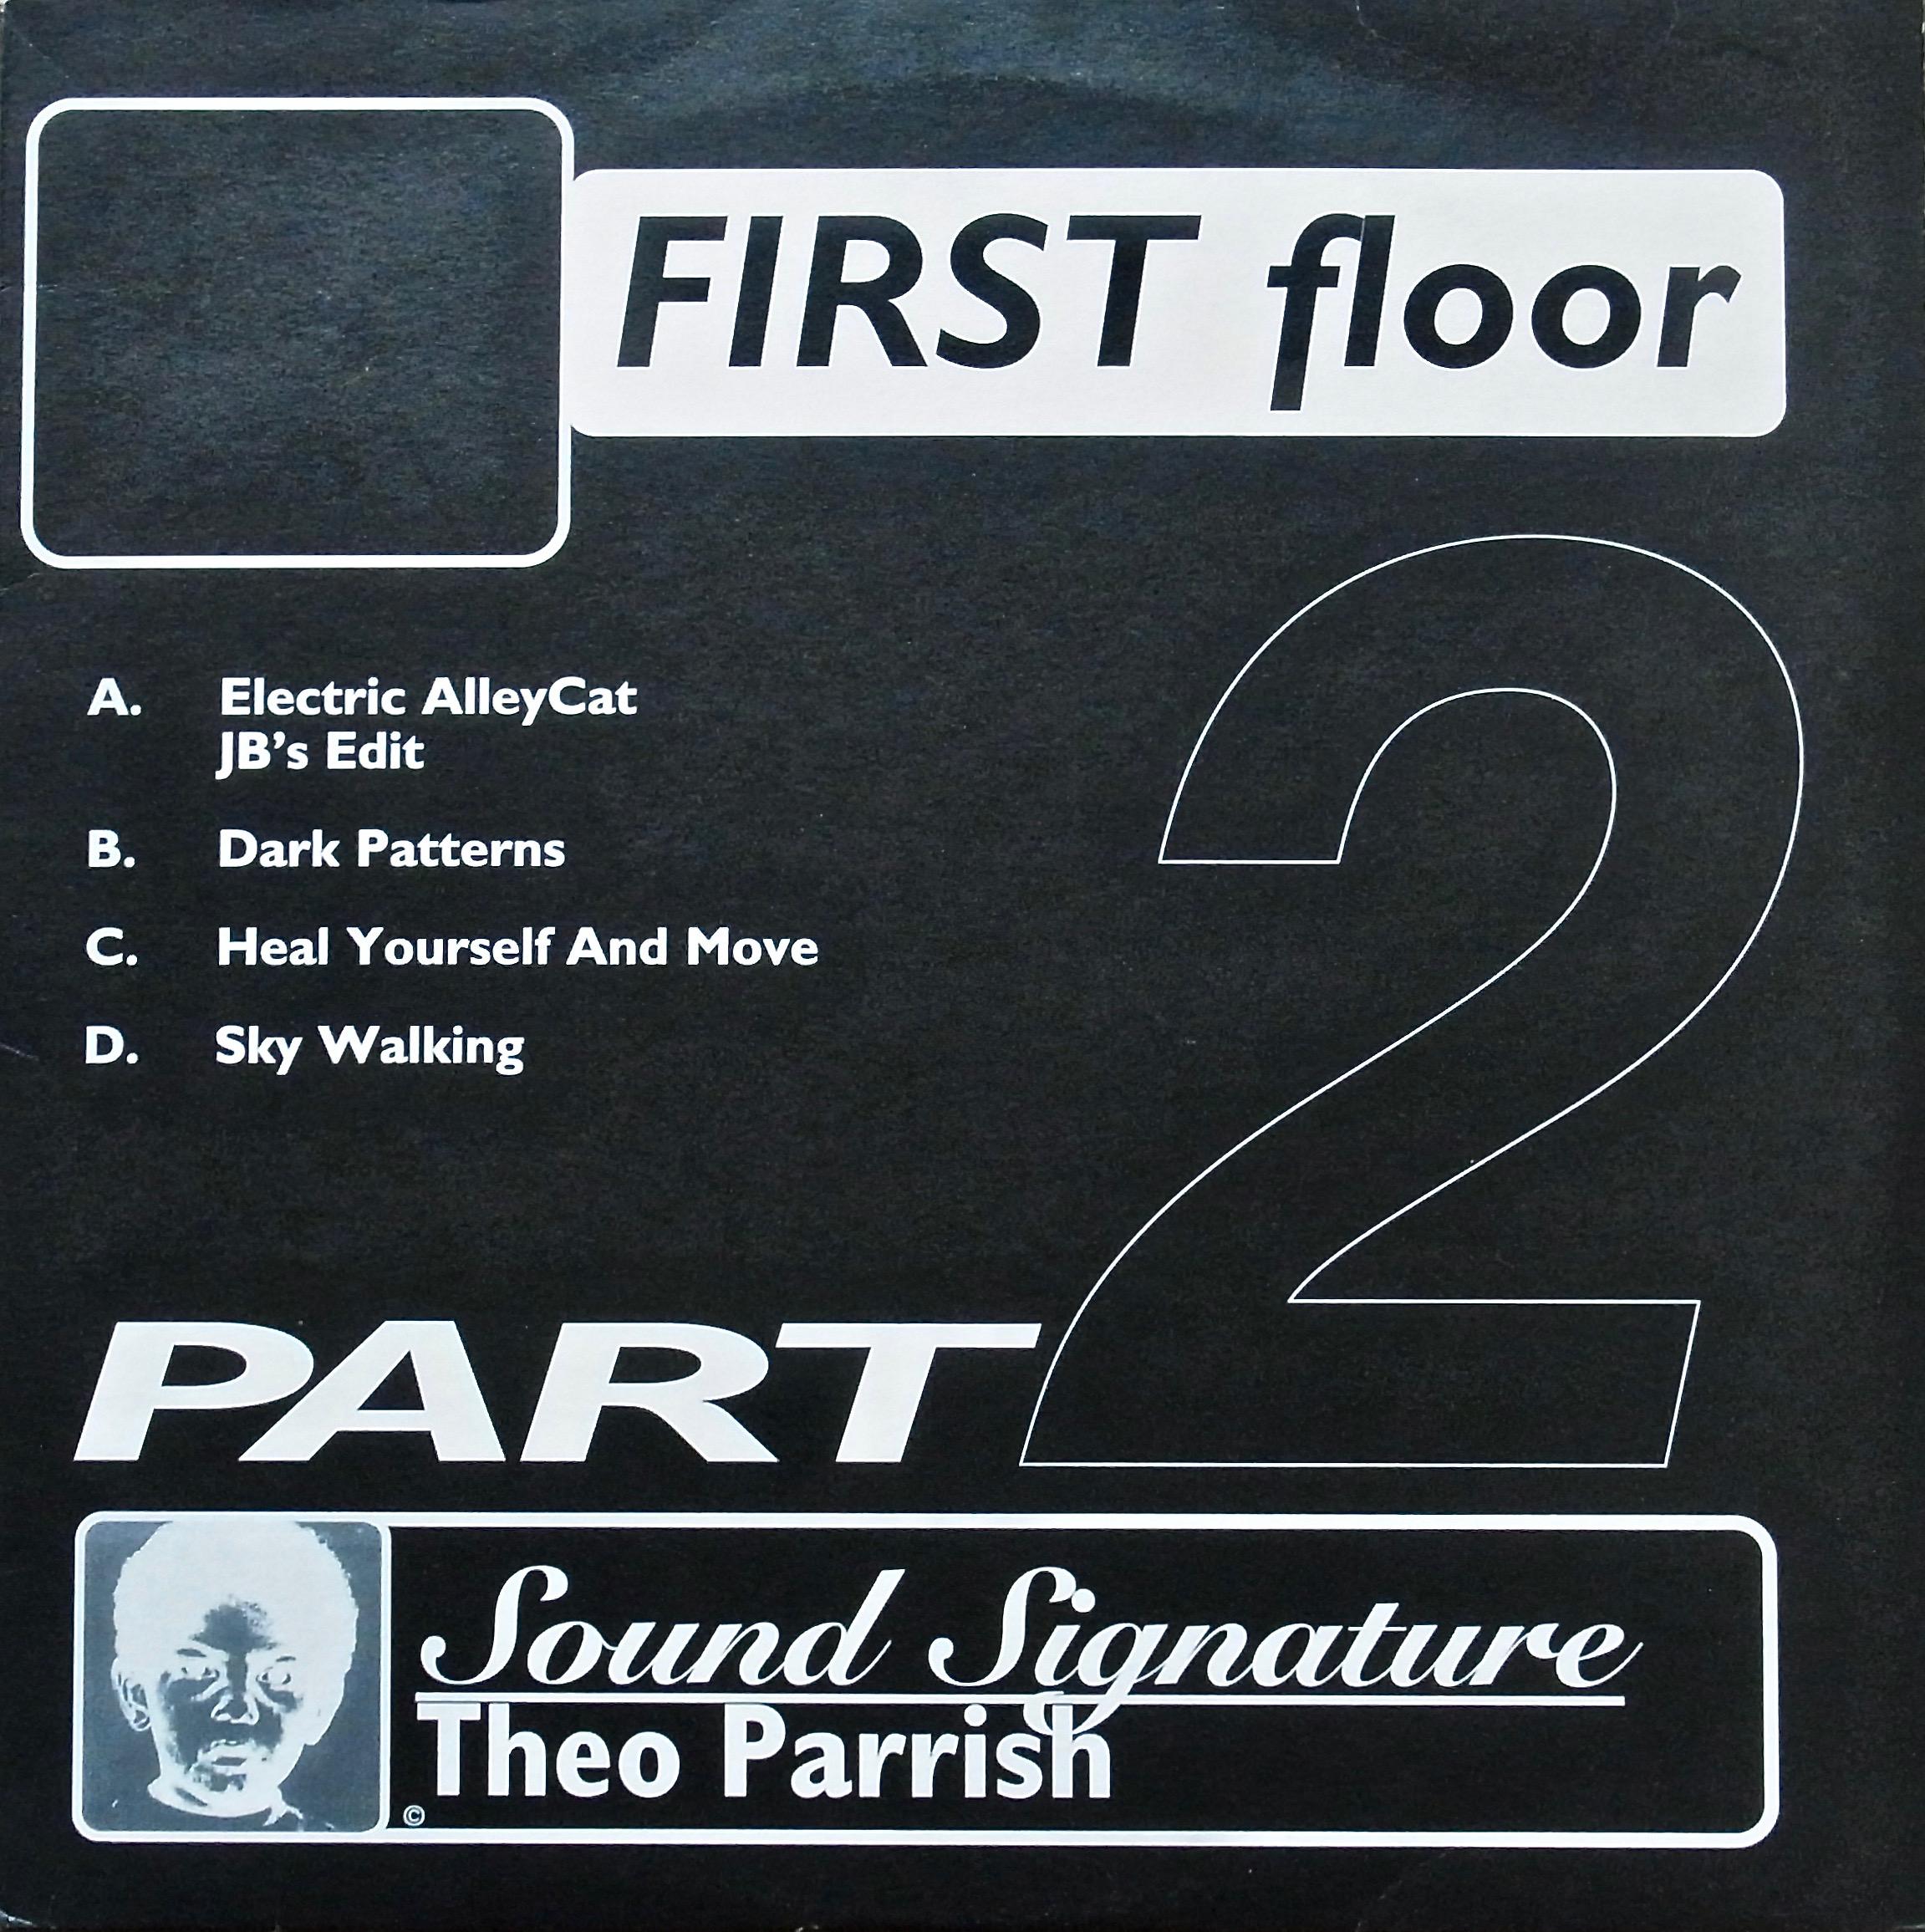 THEO PARRISH / First Floor (Part 2)